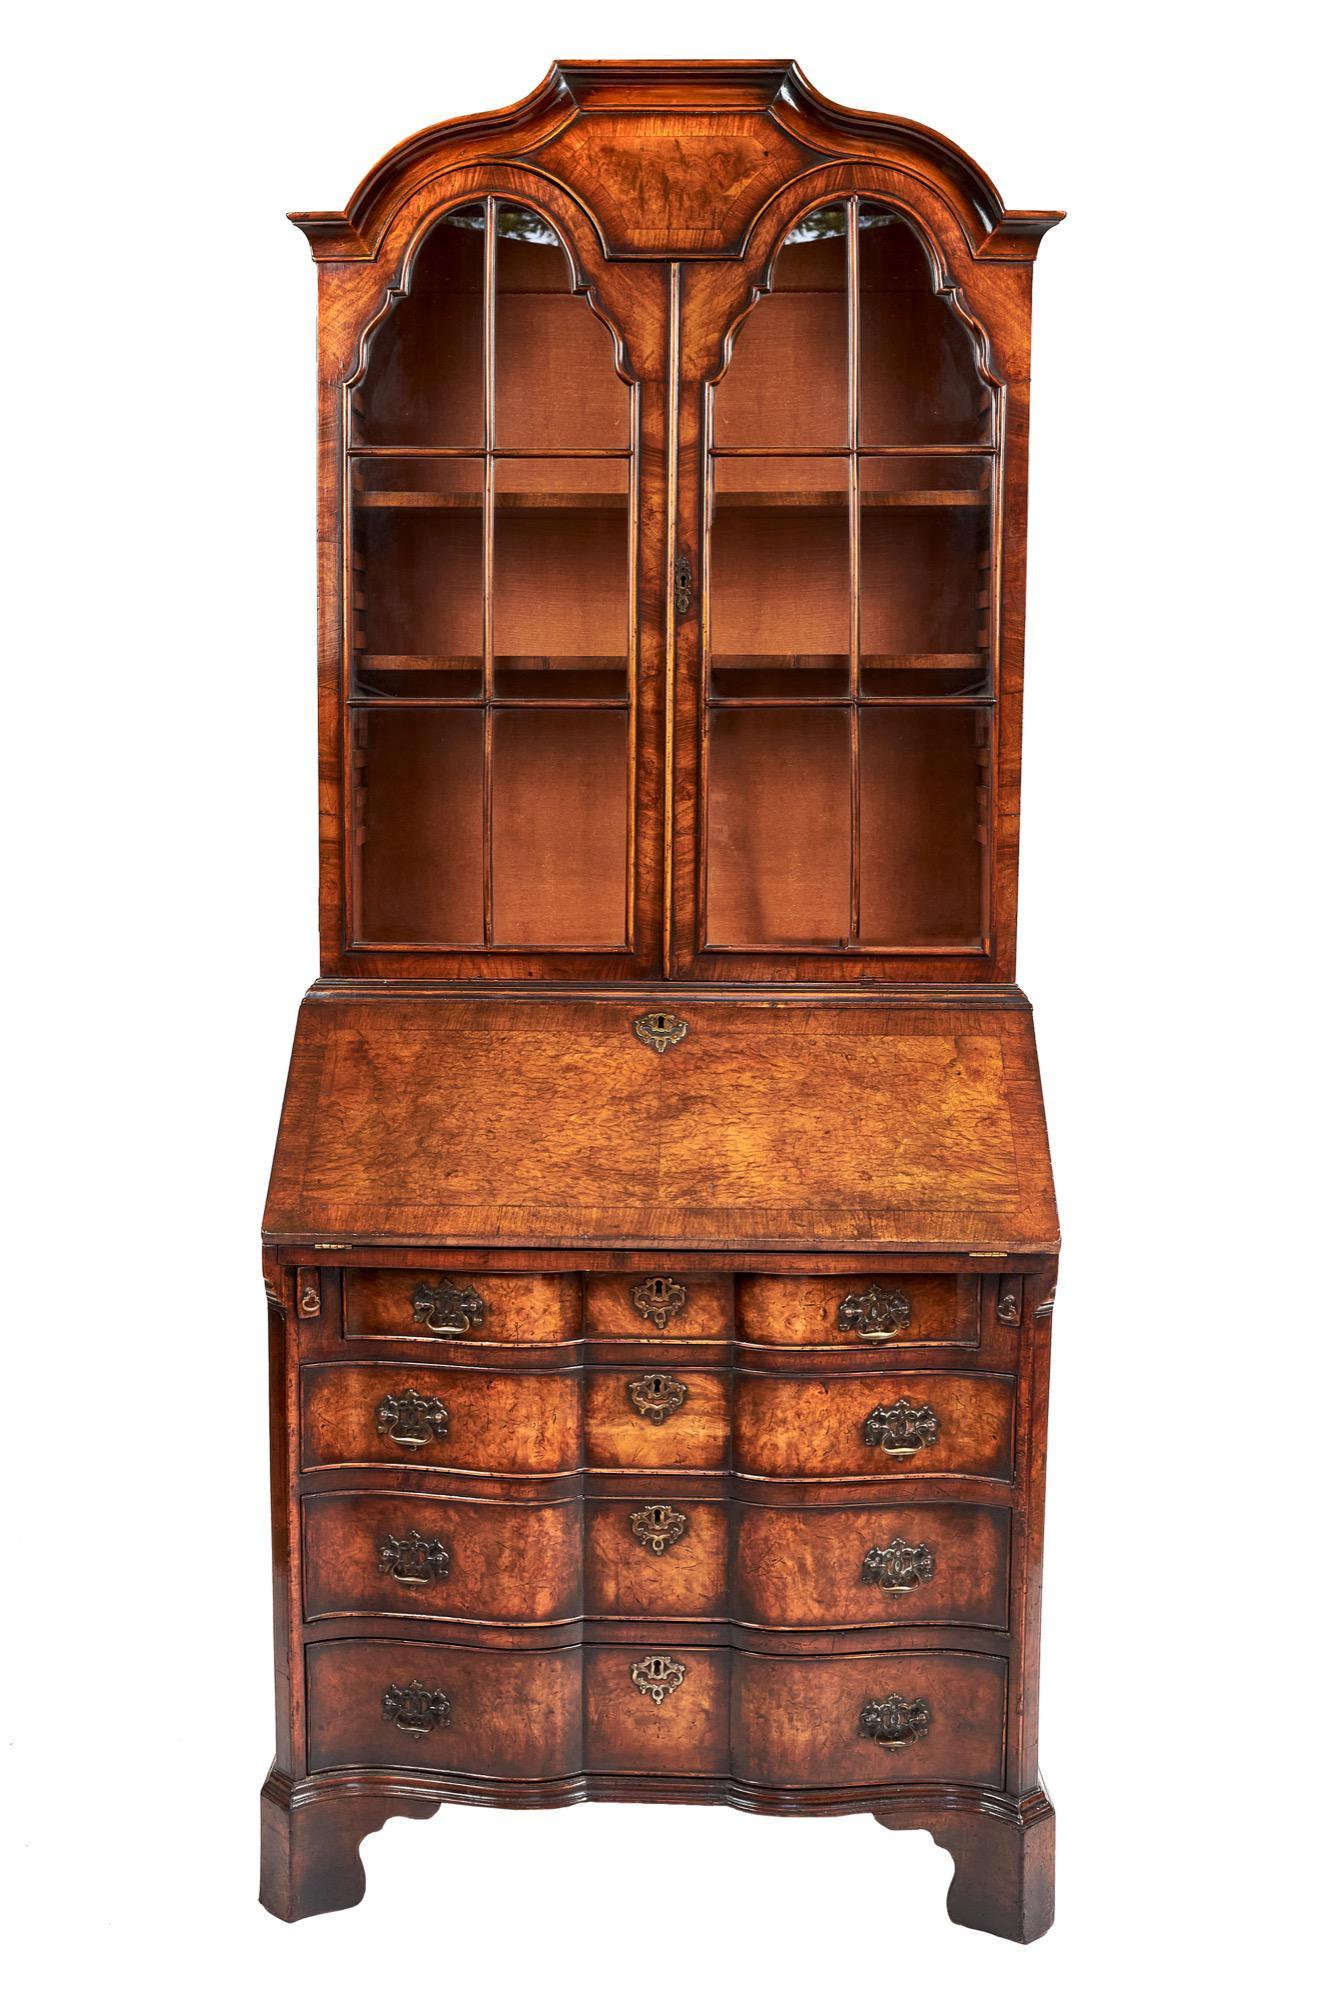 Paul Watson Antiques & interiors Norfolk image (5 of 11)